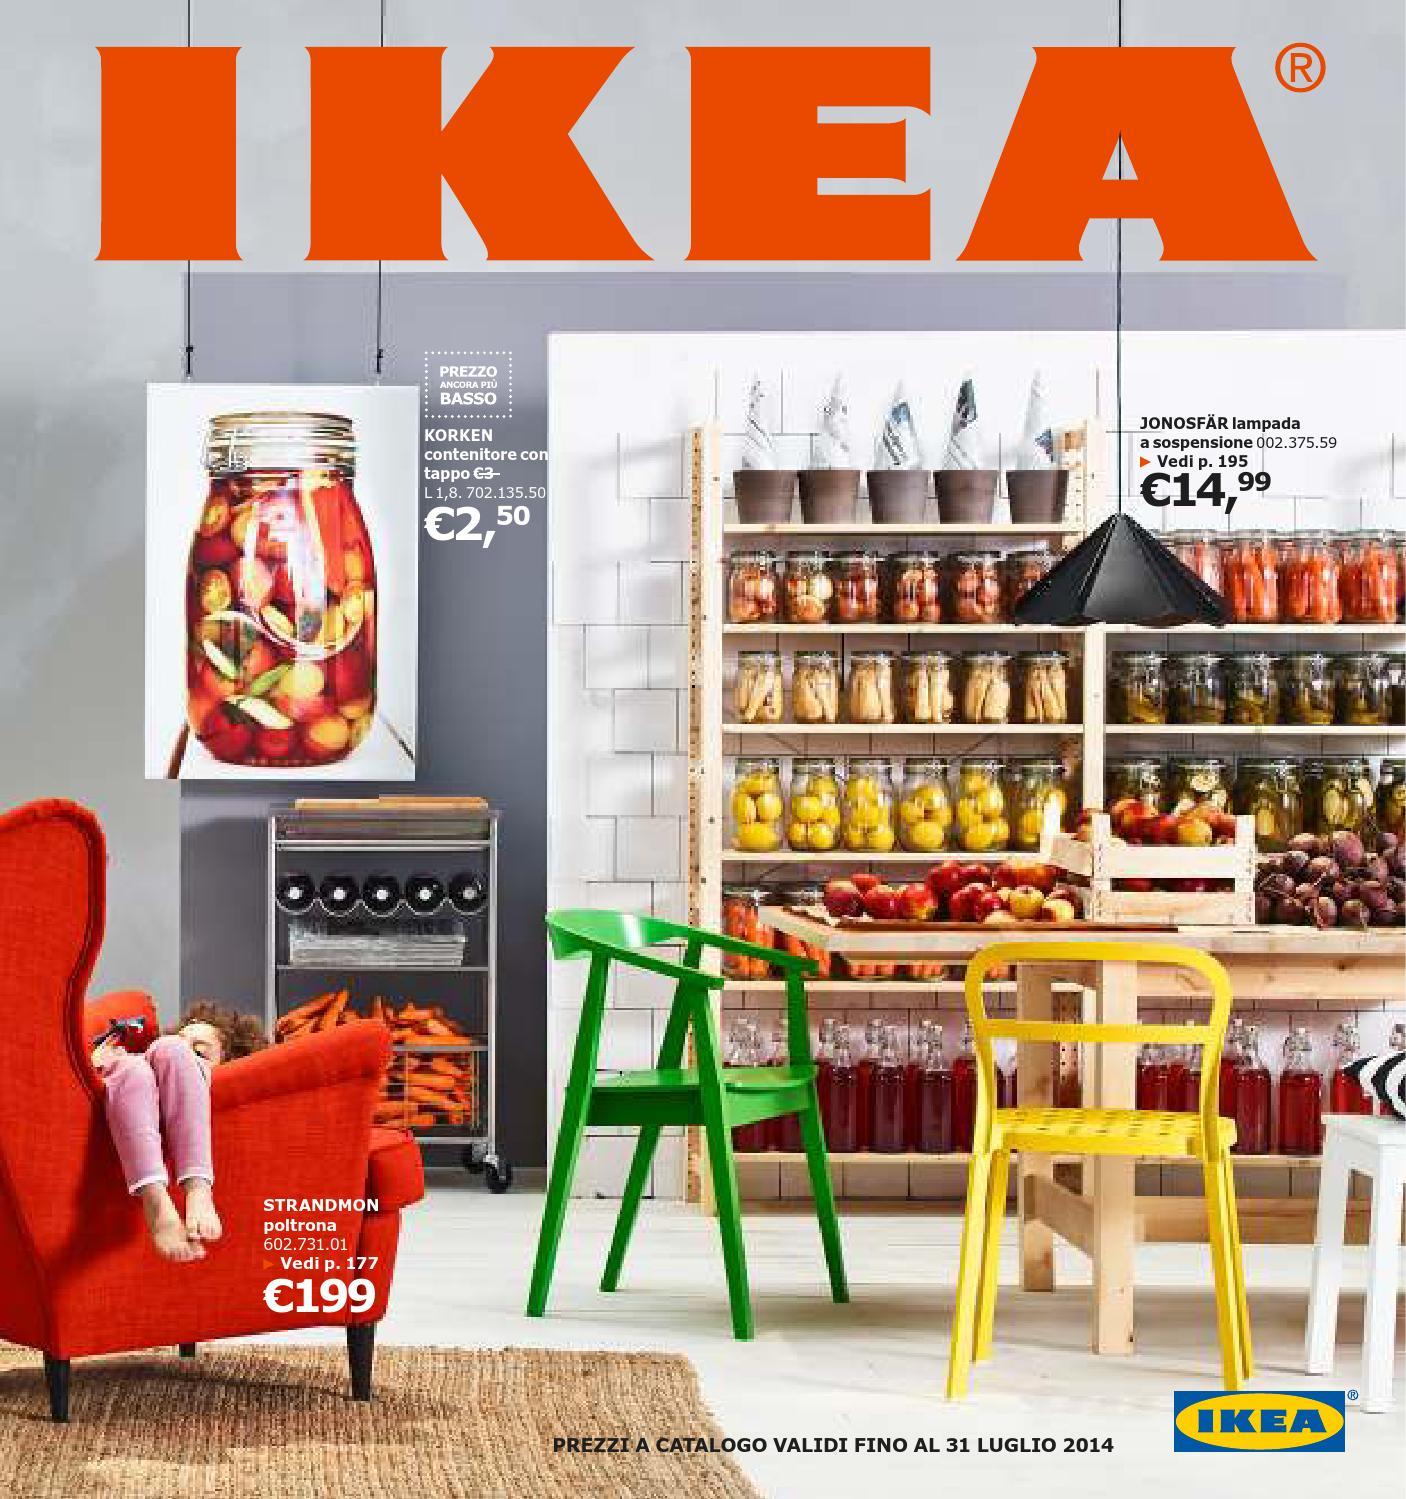 Pax Ballstad Guardaroba Angolare.Ikea 31lug14 By Fabrizio Volante Issuu